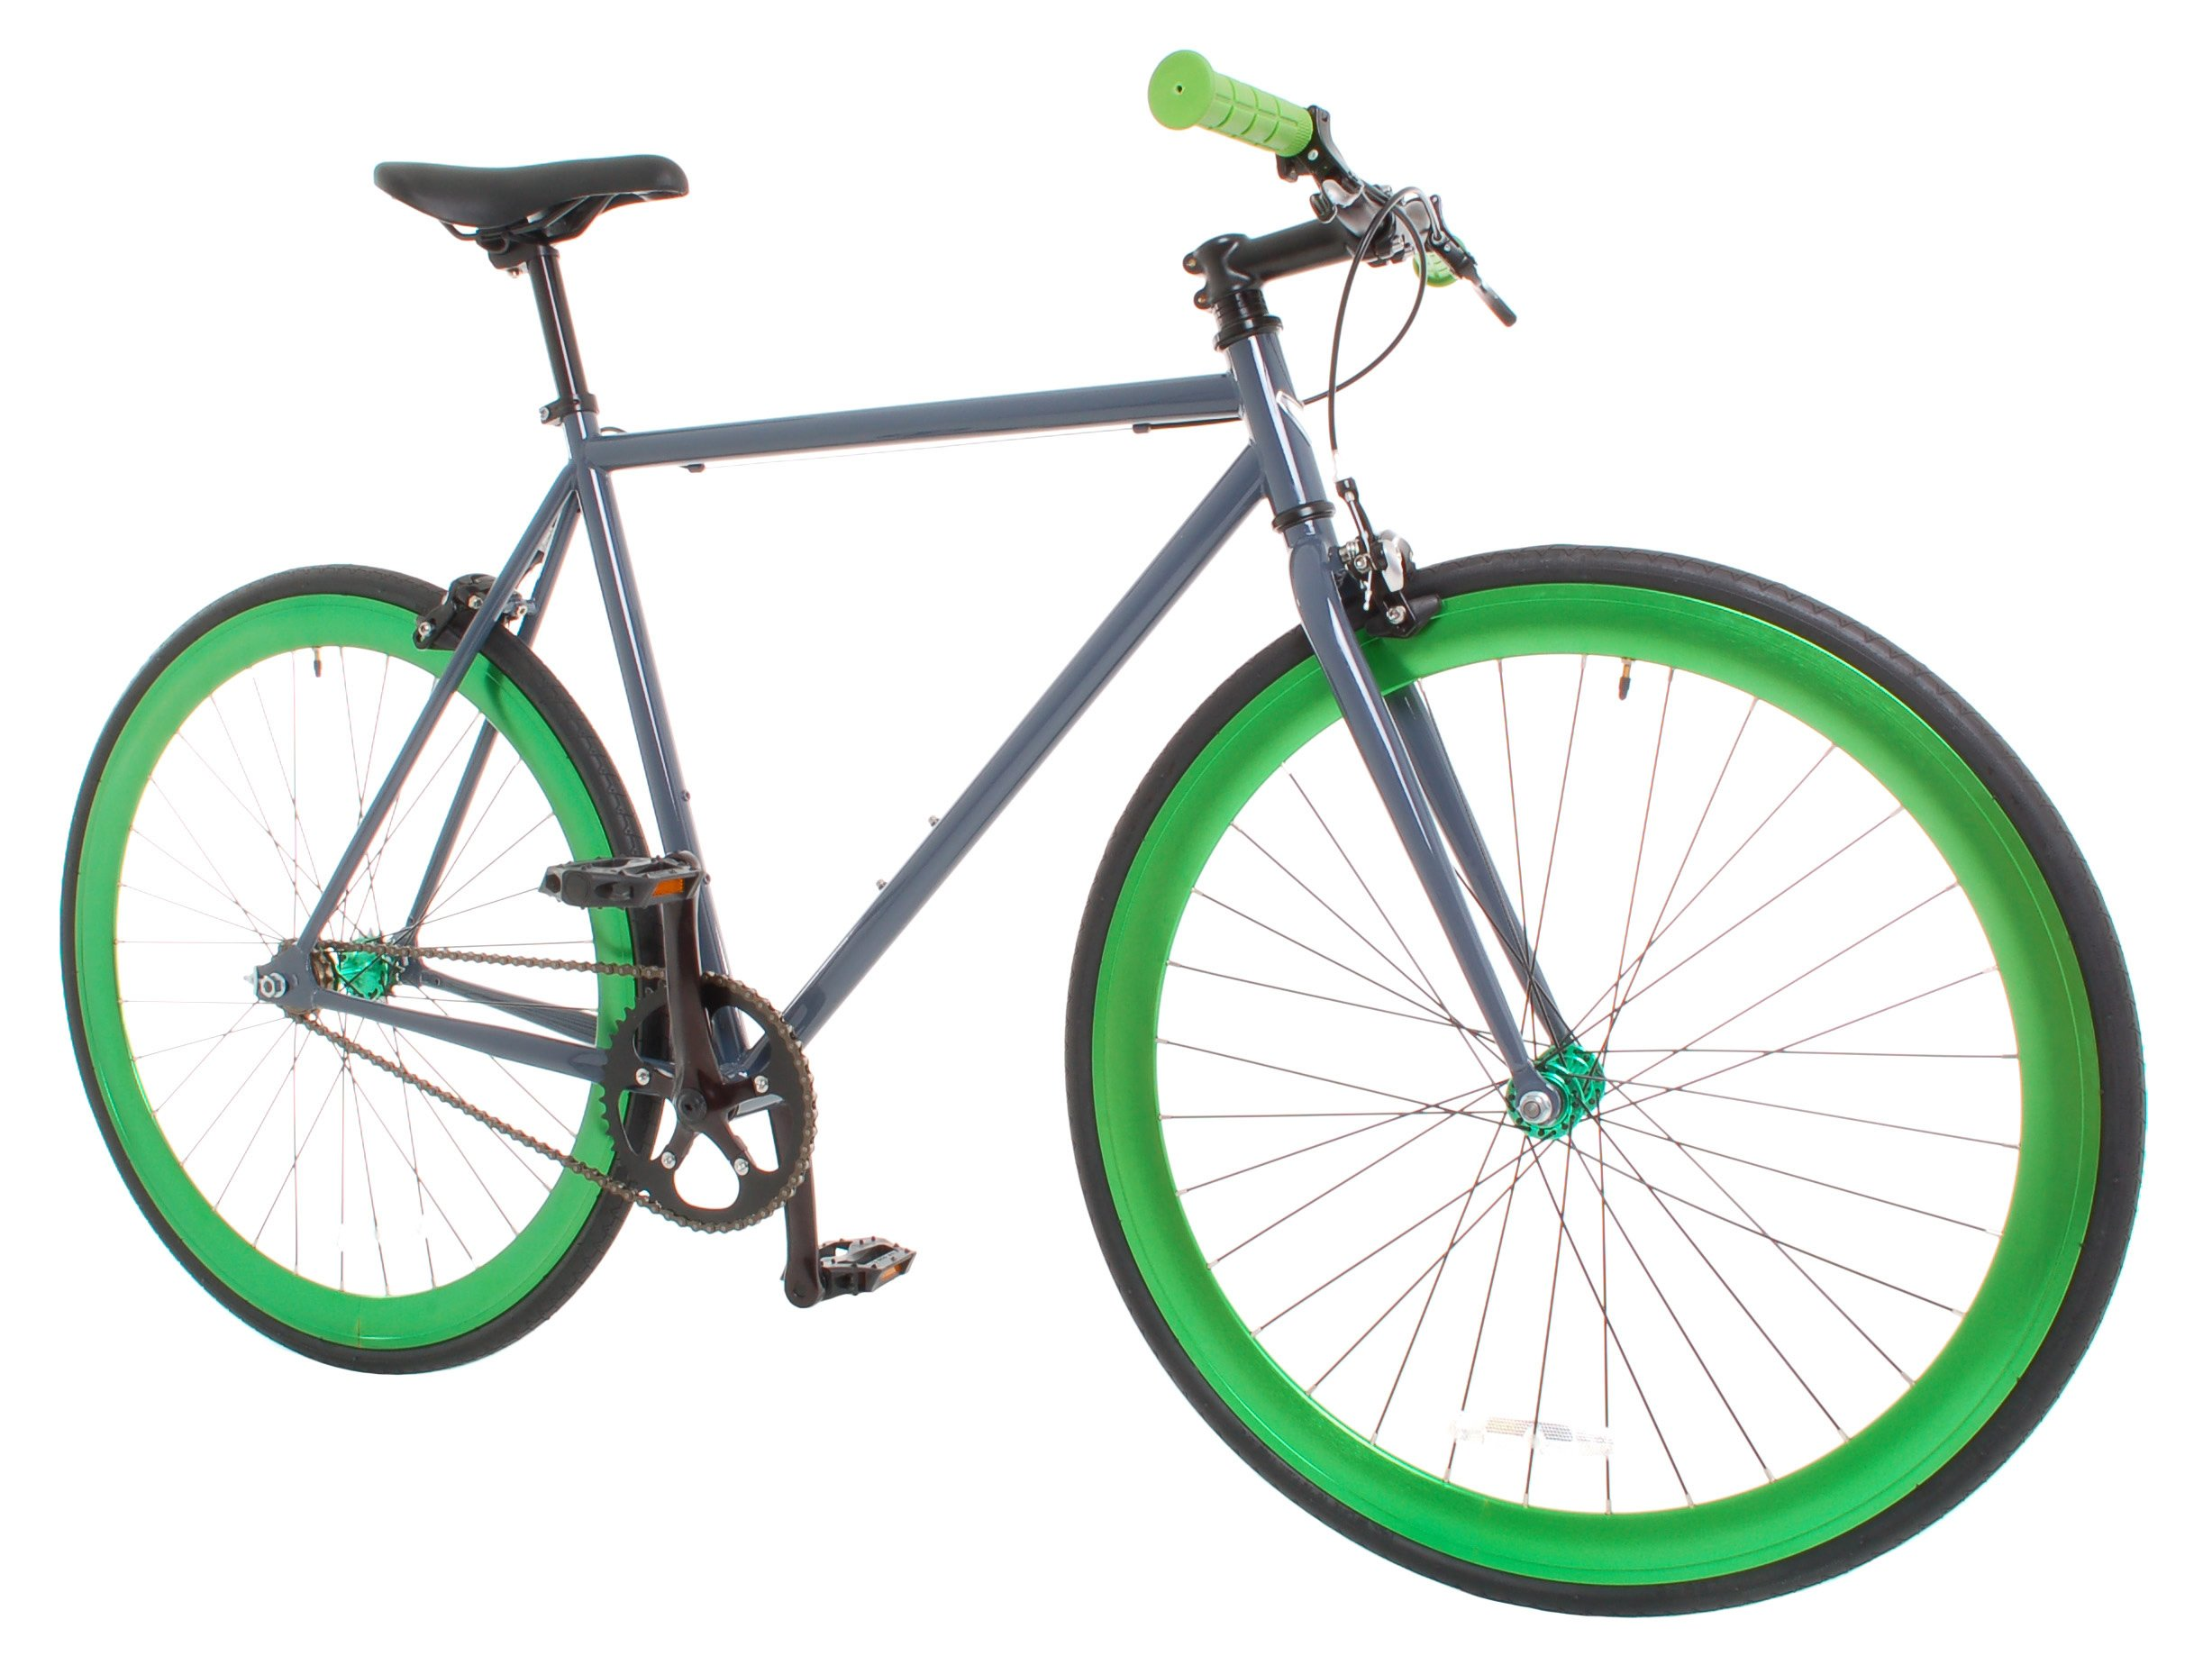 Vilano Rampage Fixed Gear Fixie Single Speed Road Bike, Grey/Green, Large/58cm